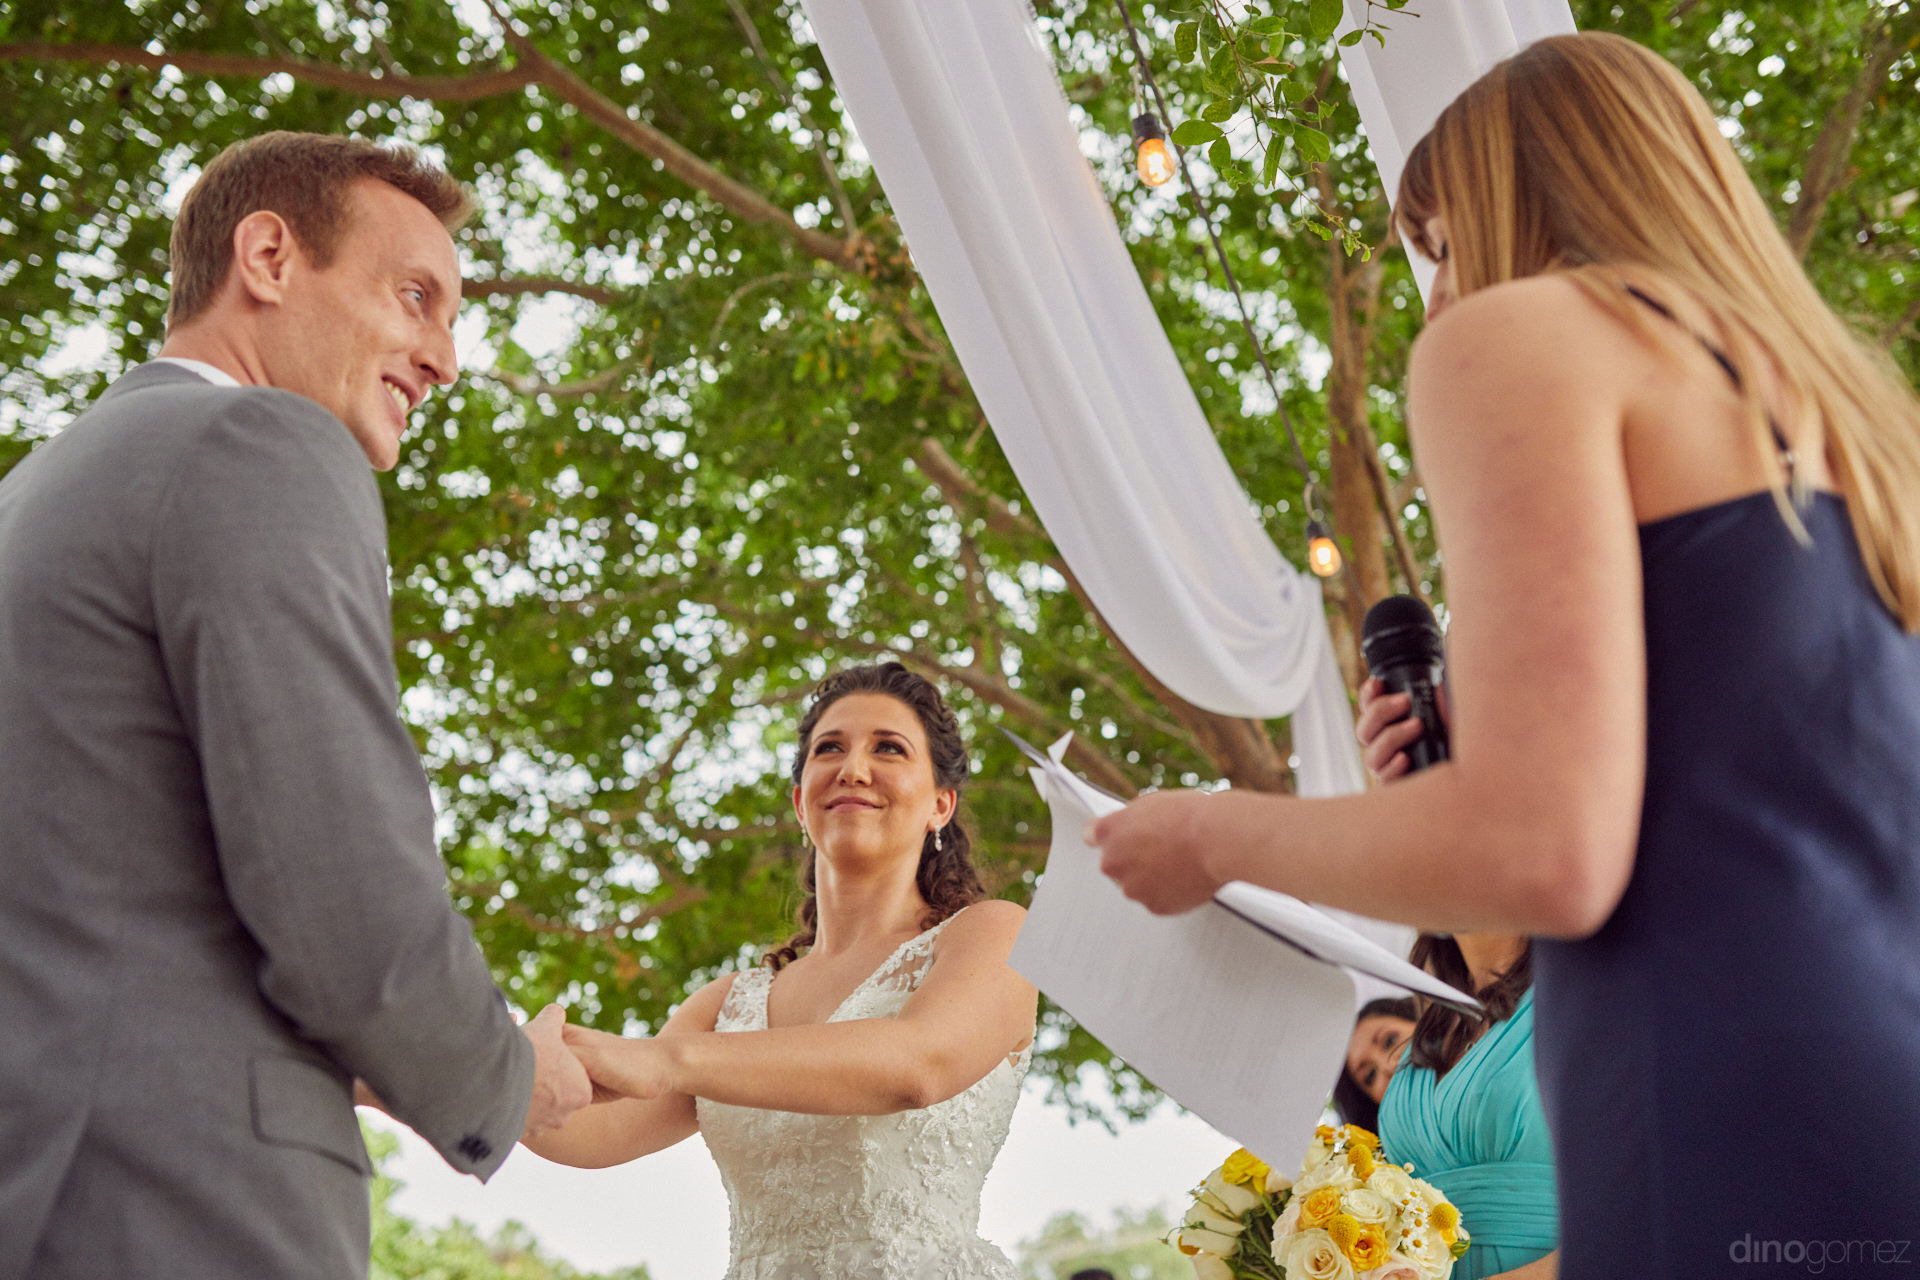 Cabo Wedding Services For Destination Weddings - Hilary & Bryan Flora Wedding